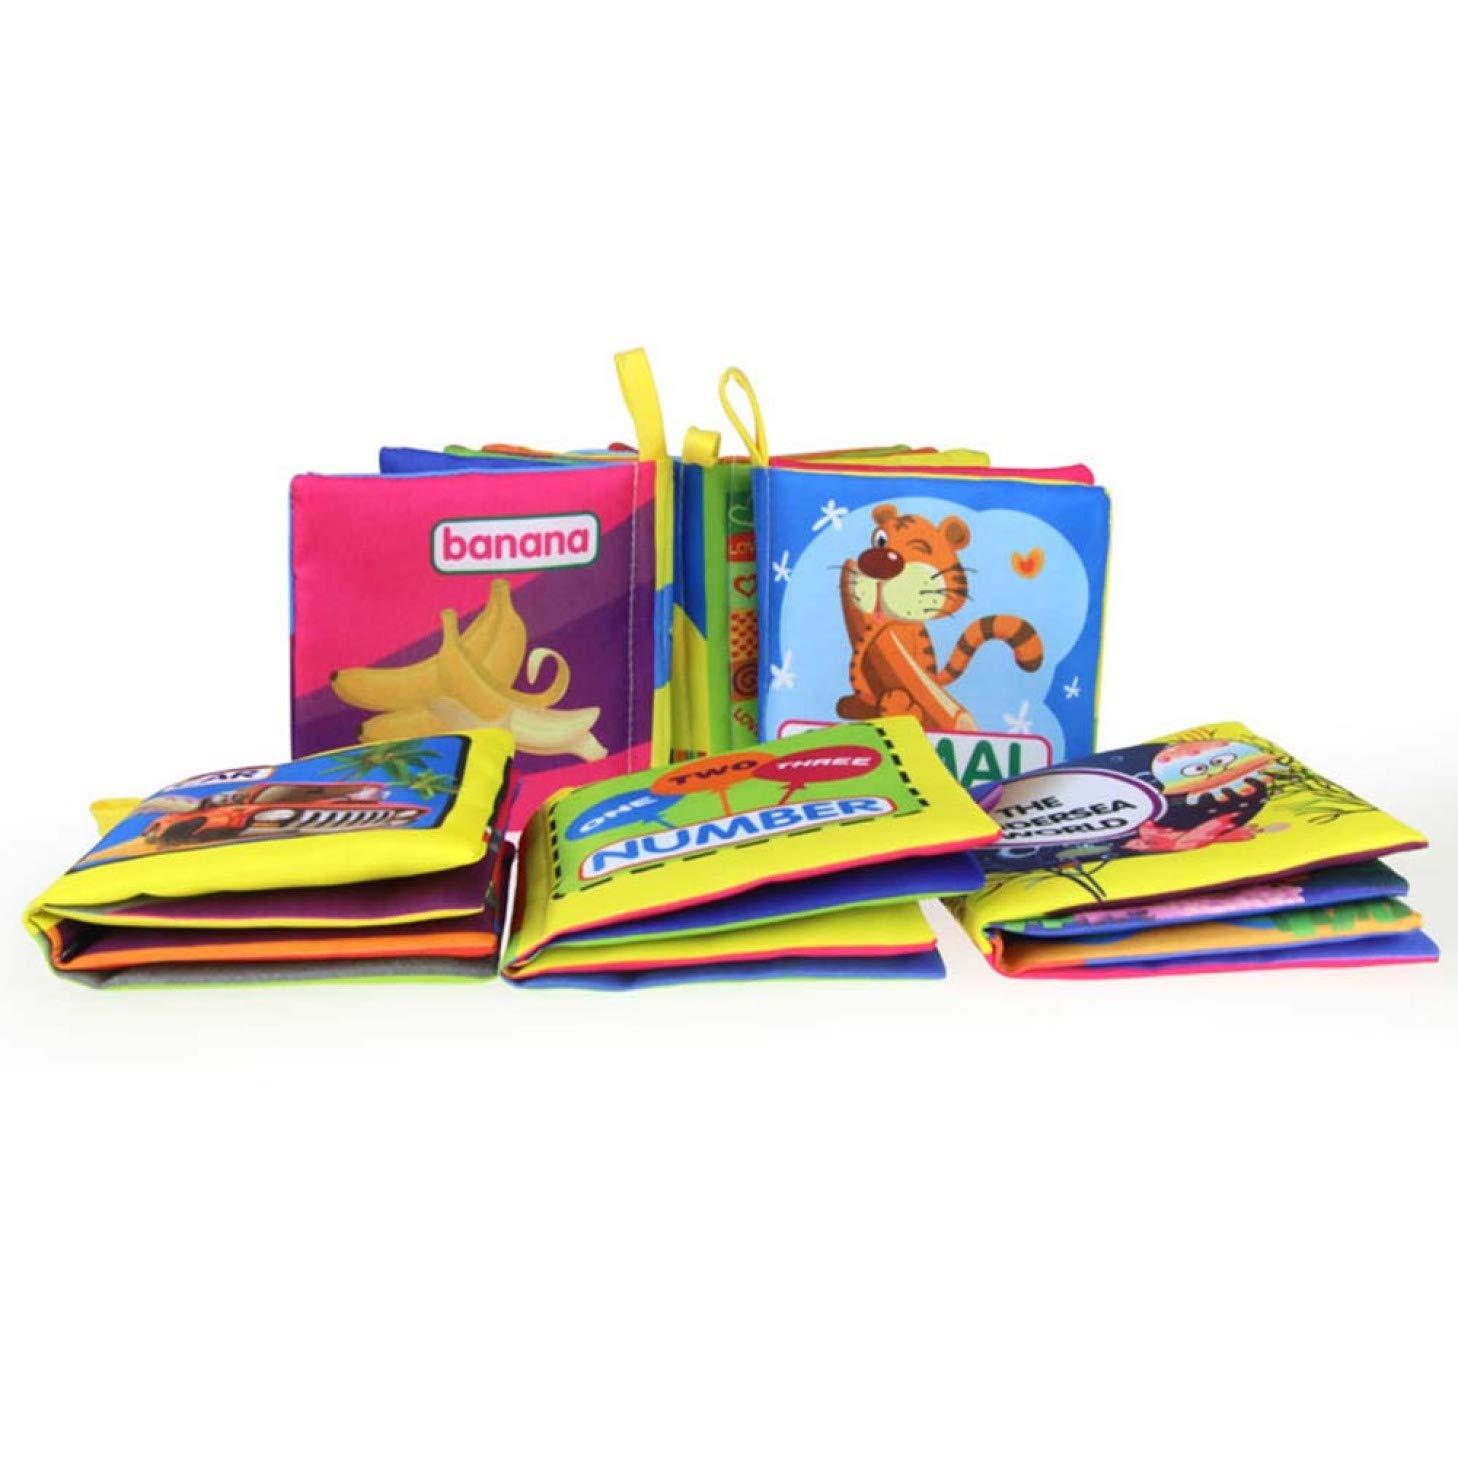 3D Libros Actividad de Tela para beb/és//ni/ños peque/ños Montague Superb Libro de cognici/ón Libro de Tela Ultra Suave beb/é Libros Touch and Feel Tela Libro Aprender a sensorial Libro